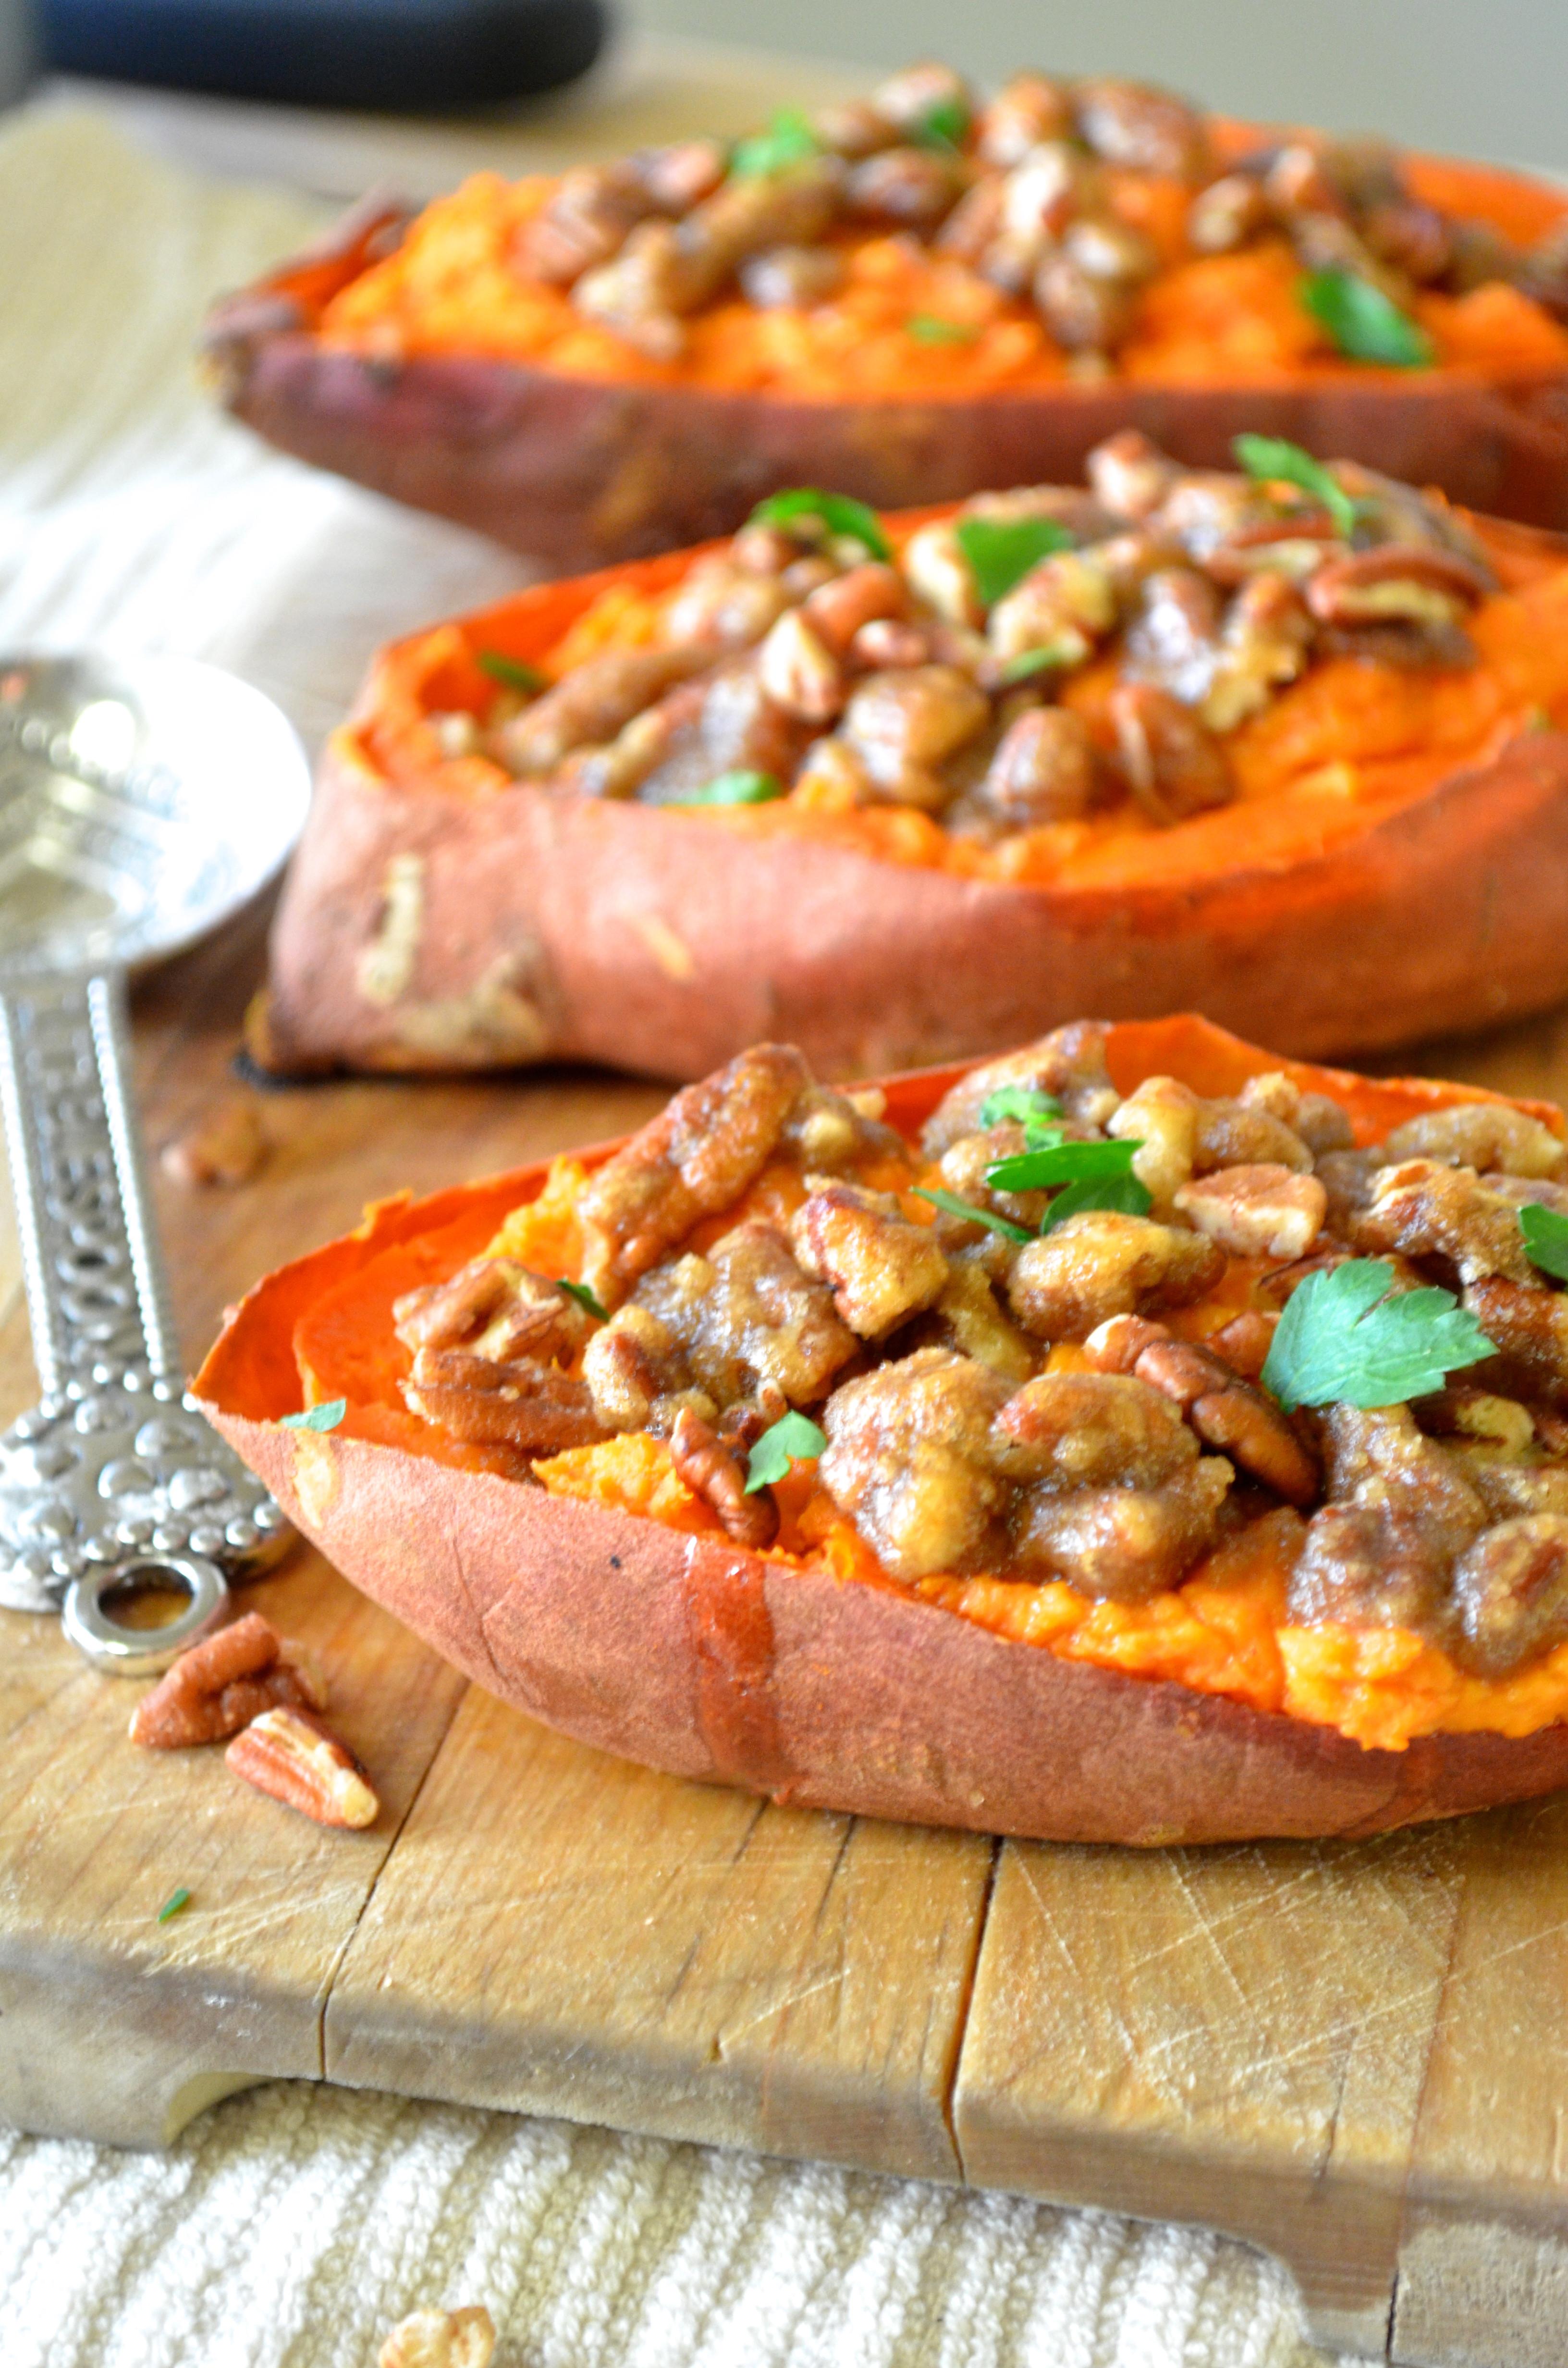 Sweet Potato Healthy  Twice Baked Sweet Potatoes with Pecan Streusel